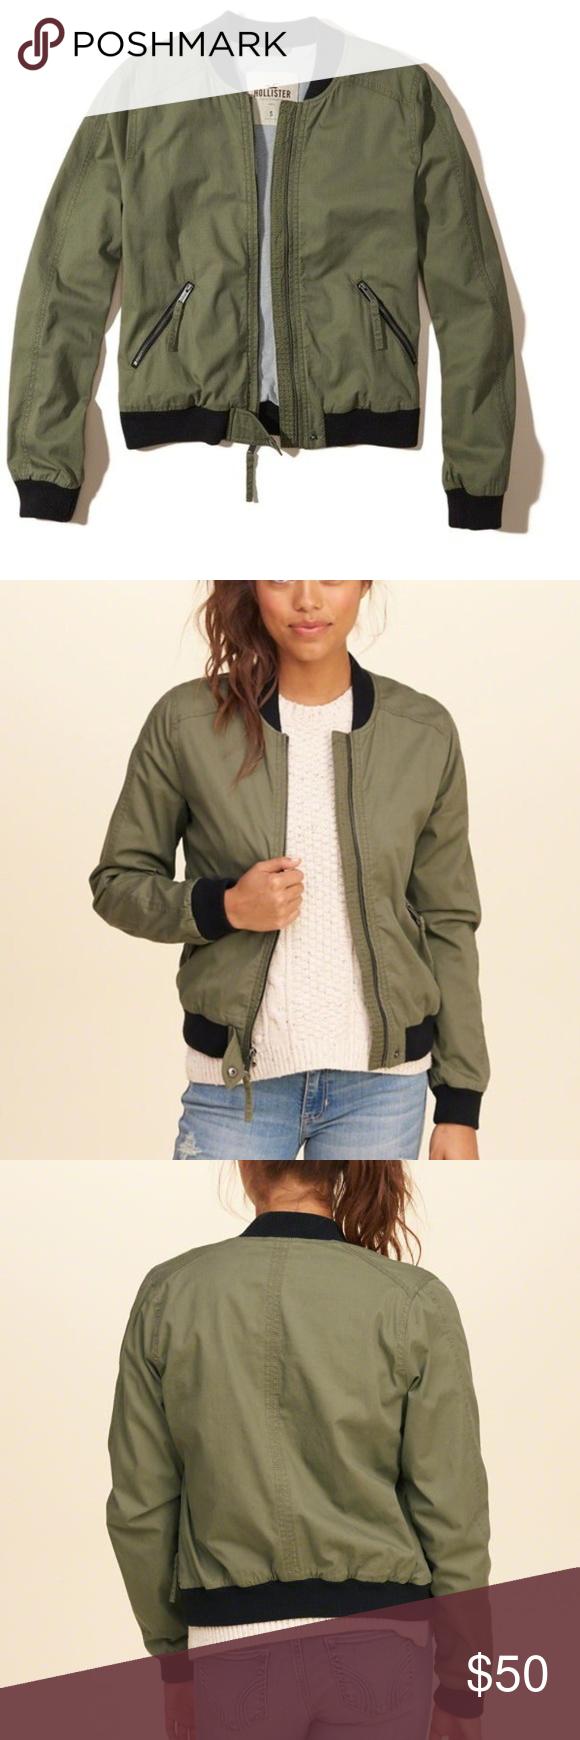 Hollister Olive Green Twill Bomber Jacket M Nwt Bomber Jacket Clothes Design Hollister Jackets [ 1740 x 580 Pixel ]